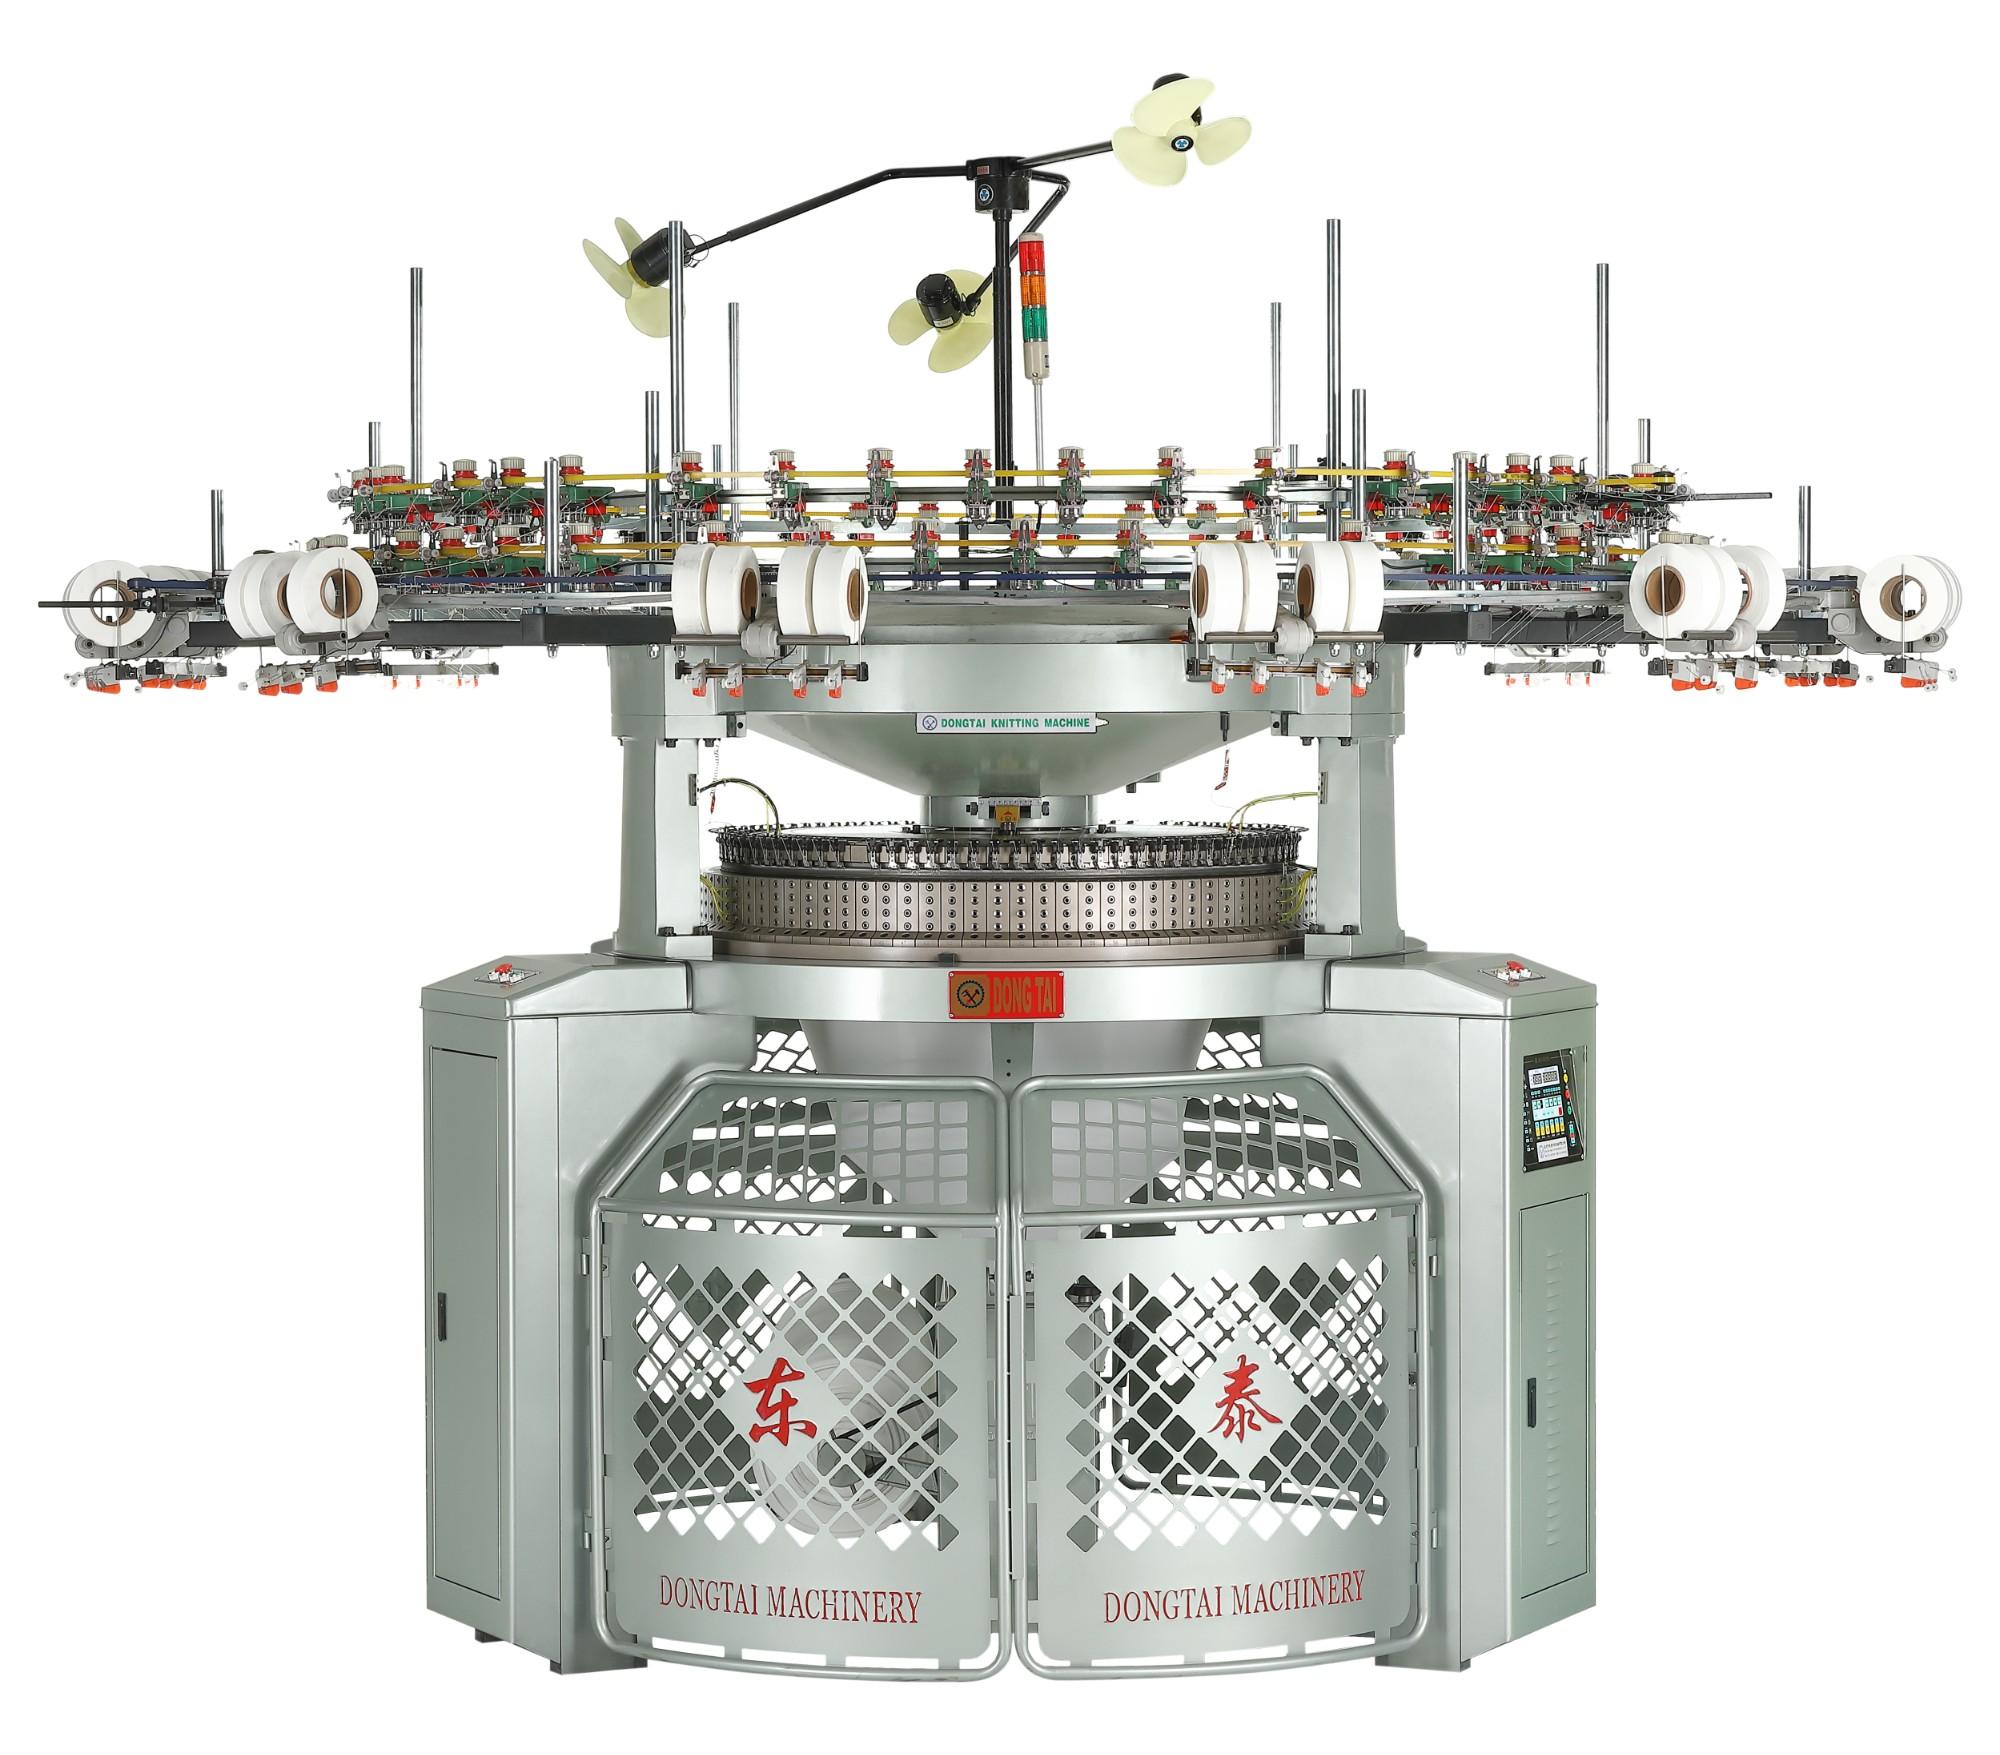 High Speed Tube Interlock Circular Knitting Machine Manufacturers, High Speed Tube Interlock Circular Knitting Machine Factory, Supply High Speed Tube Interlock Circular Knitting Machine